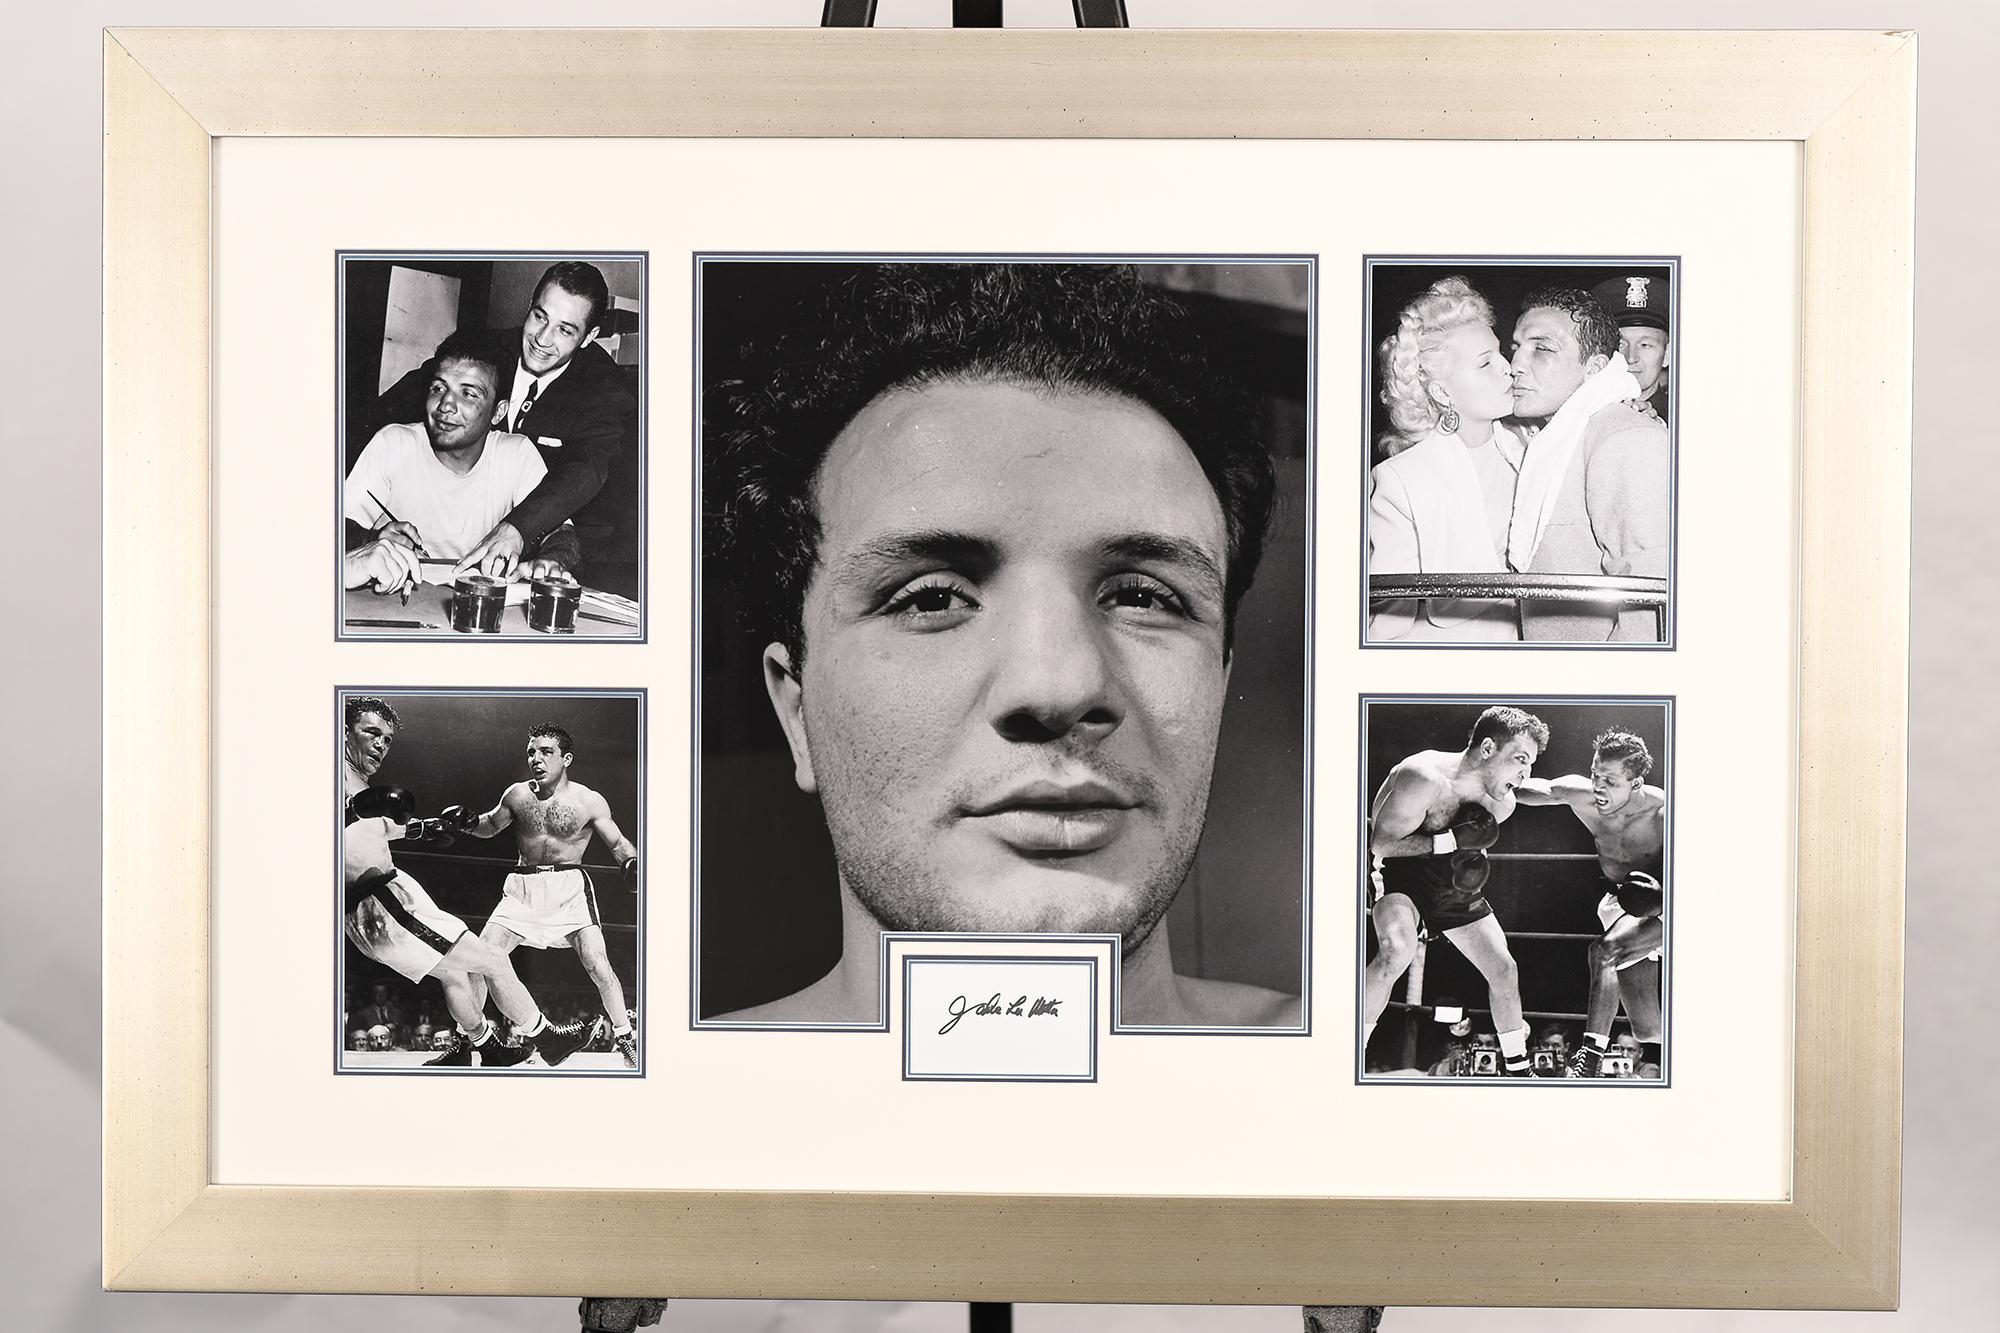 Jake Lamotta Framed Signature Presentation